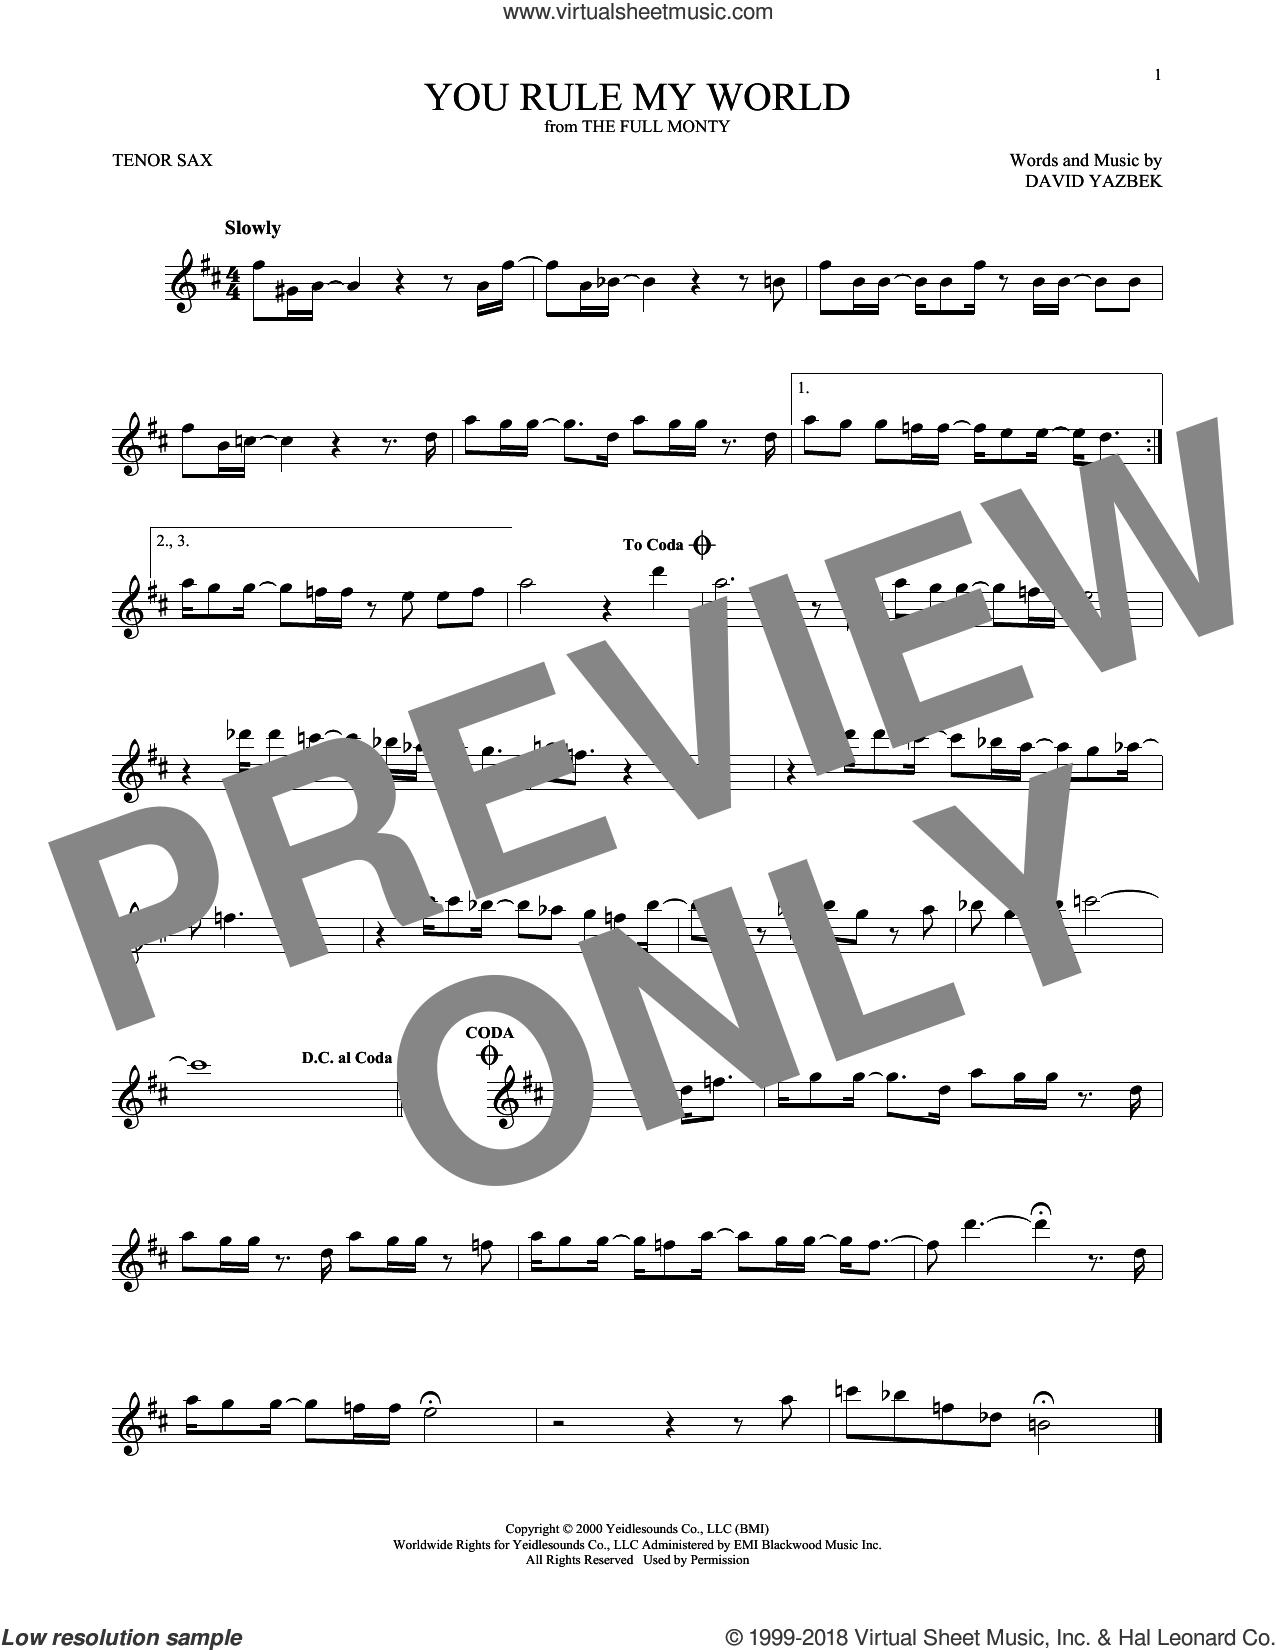 You Rule My World sheet music for tenor saxophone solo by David Yazbek, intermediate skill level